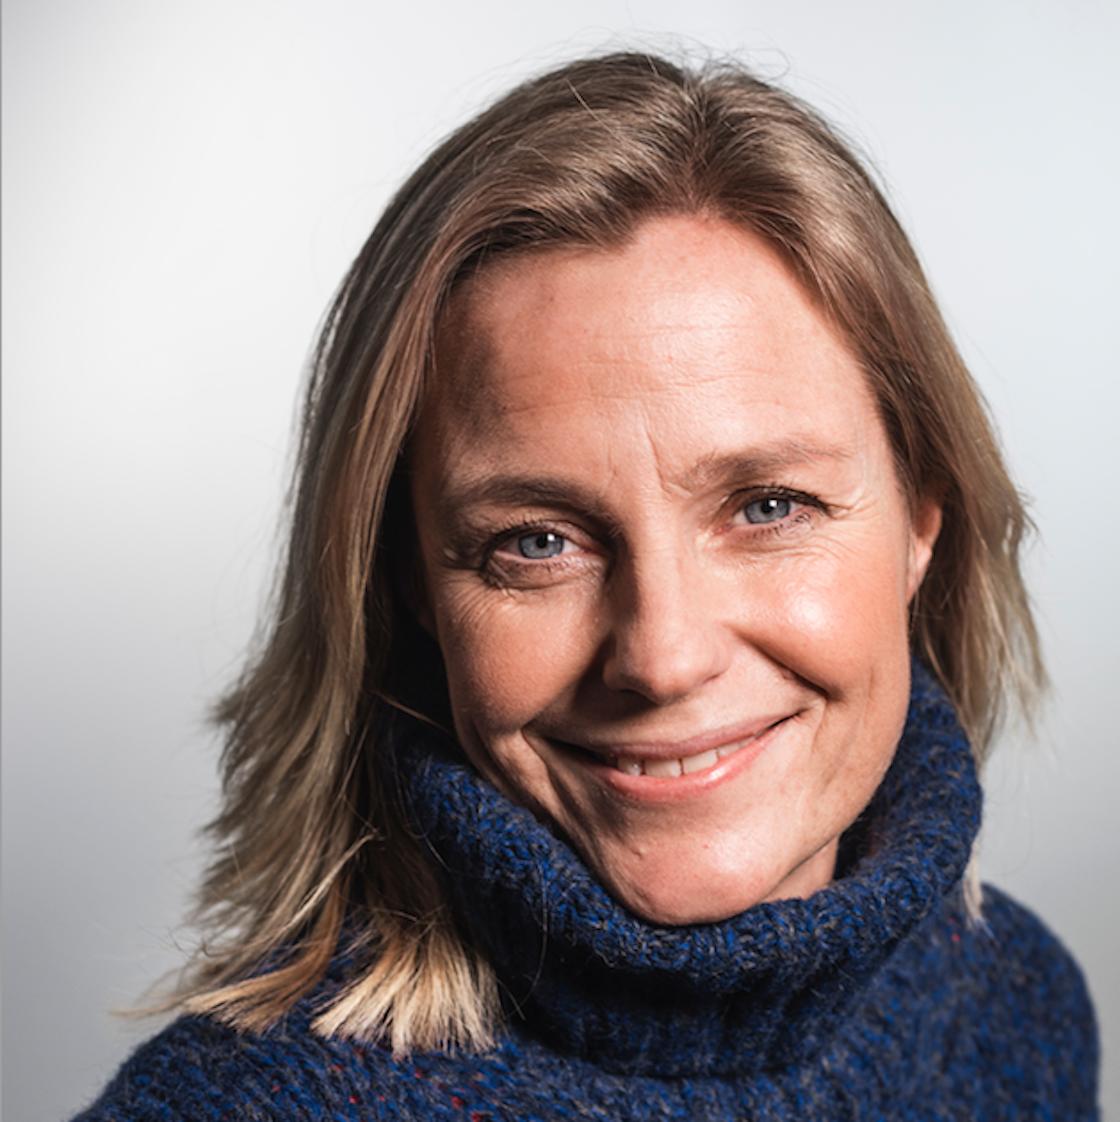 Solveig Kloppen leder en ny podkast om frivillighet i Norge.